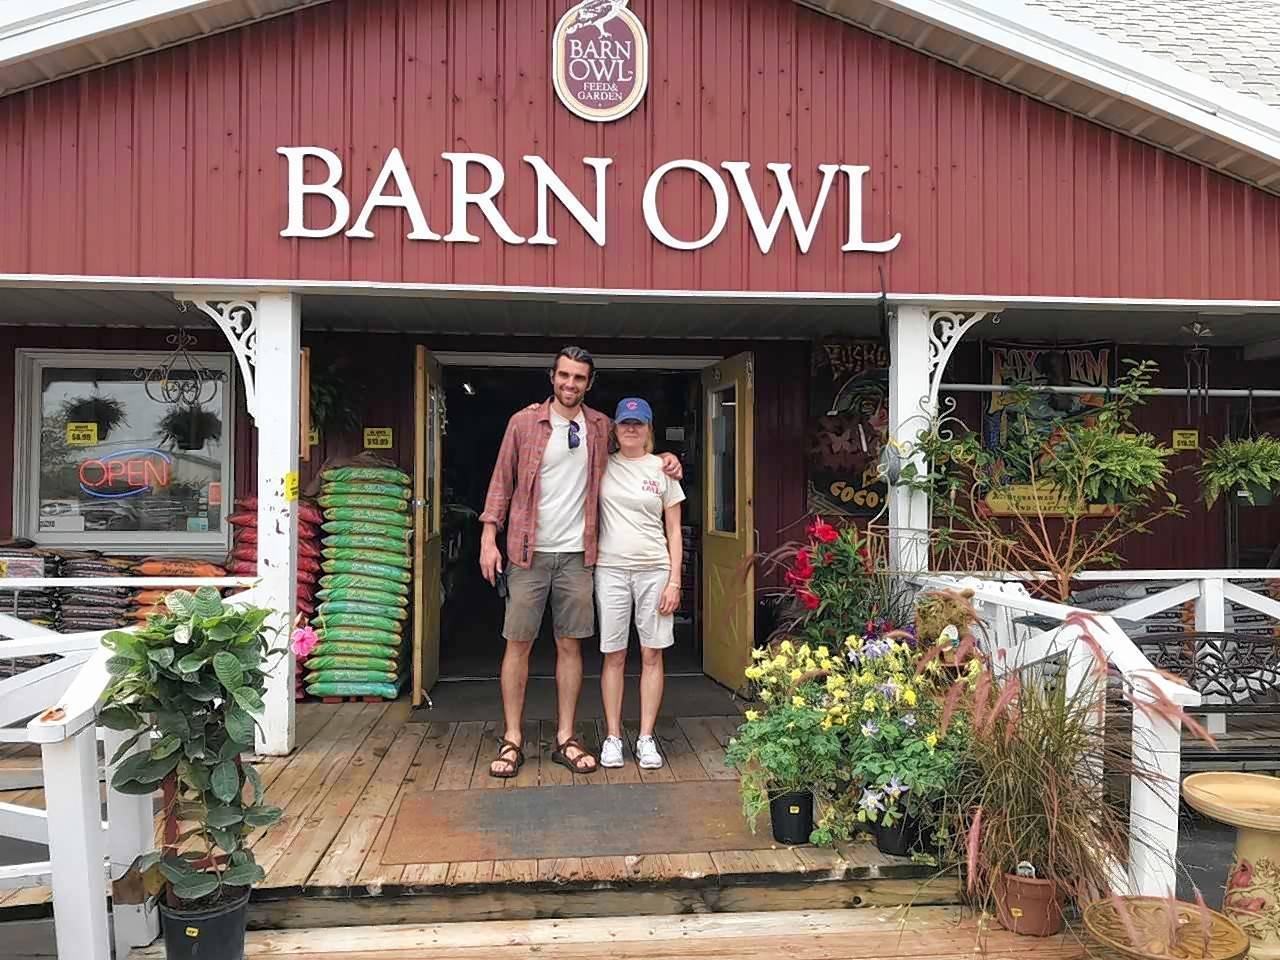 Barn Owl Garden Center, A Family Owned Business In Carol Stream, Is  Celebrating